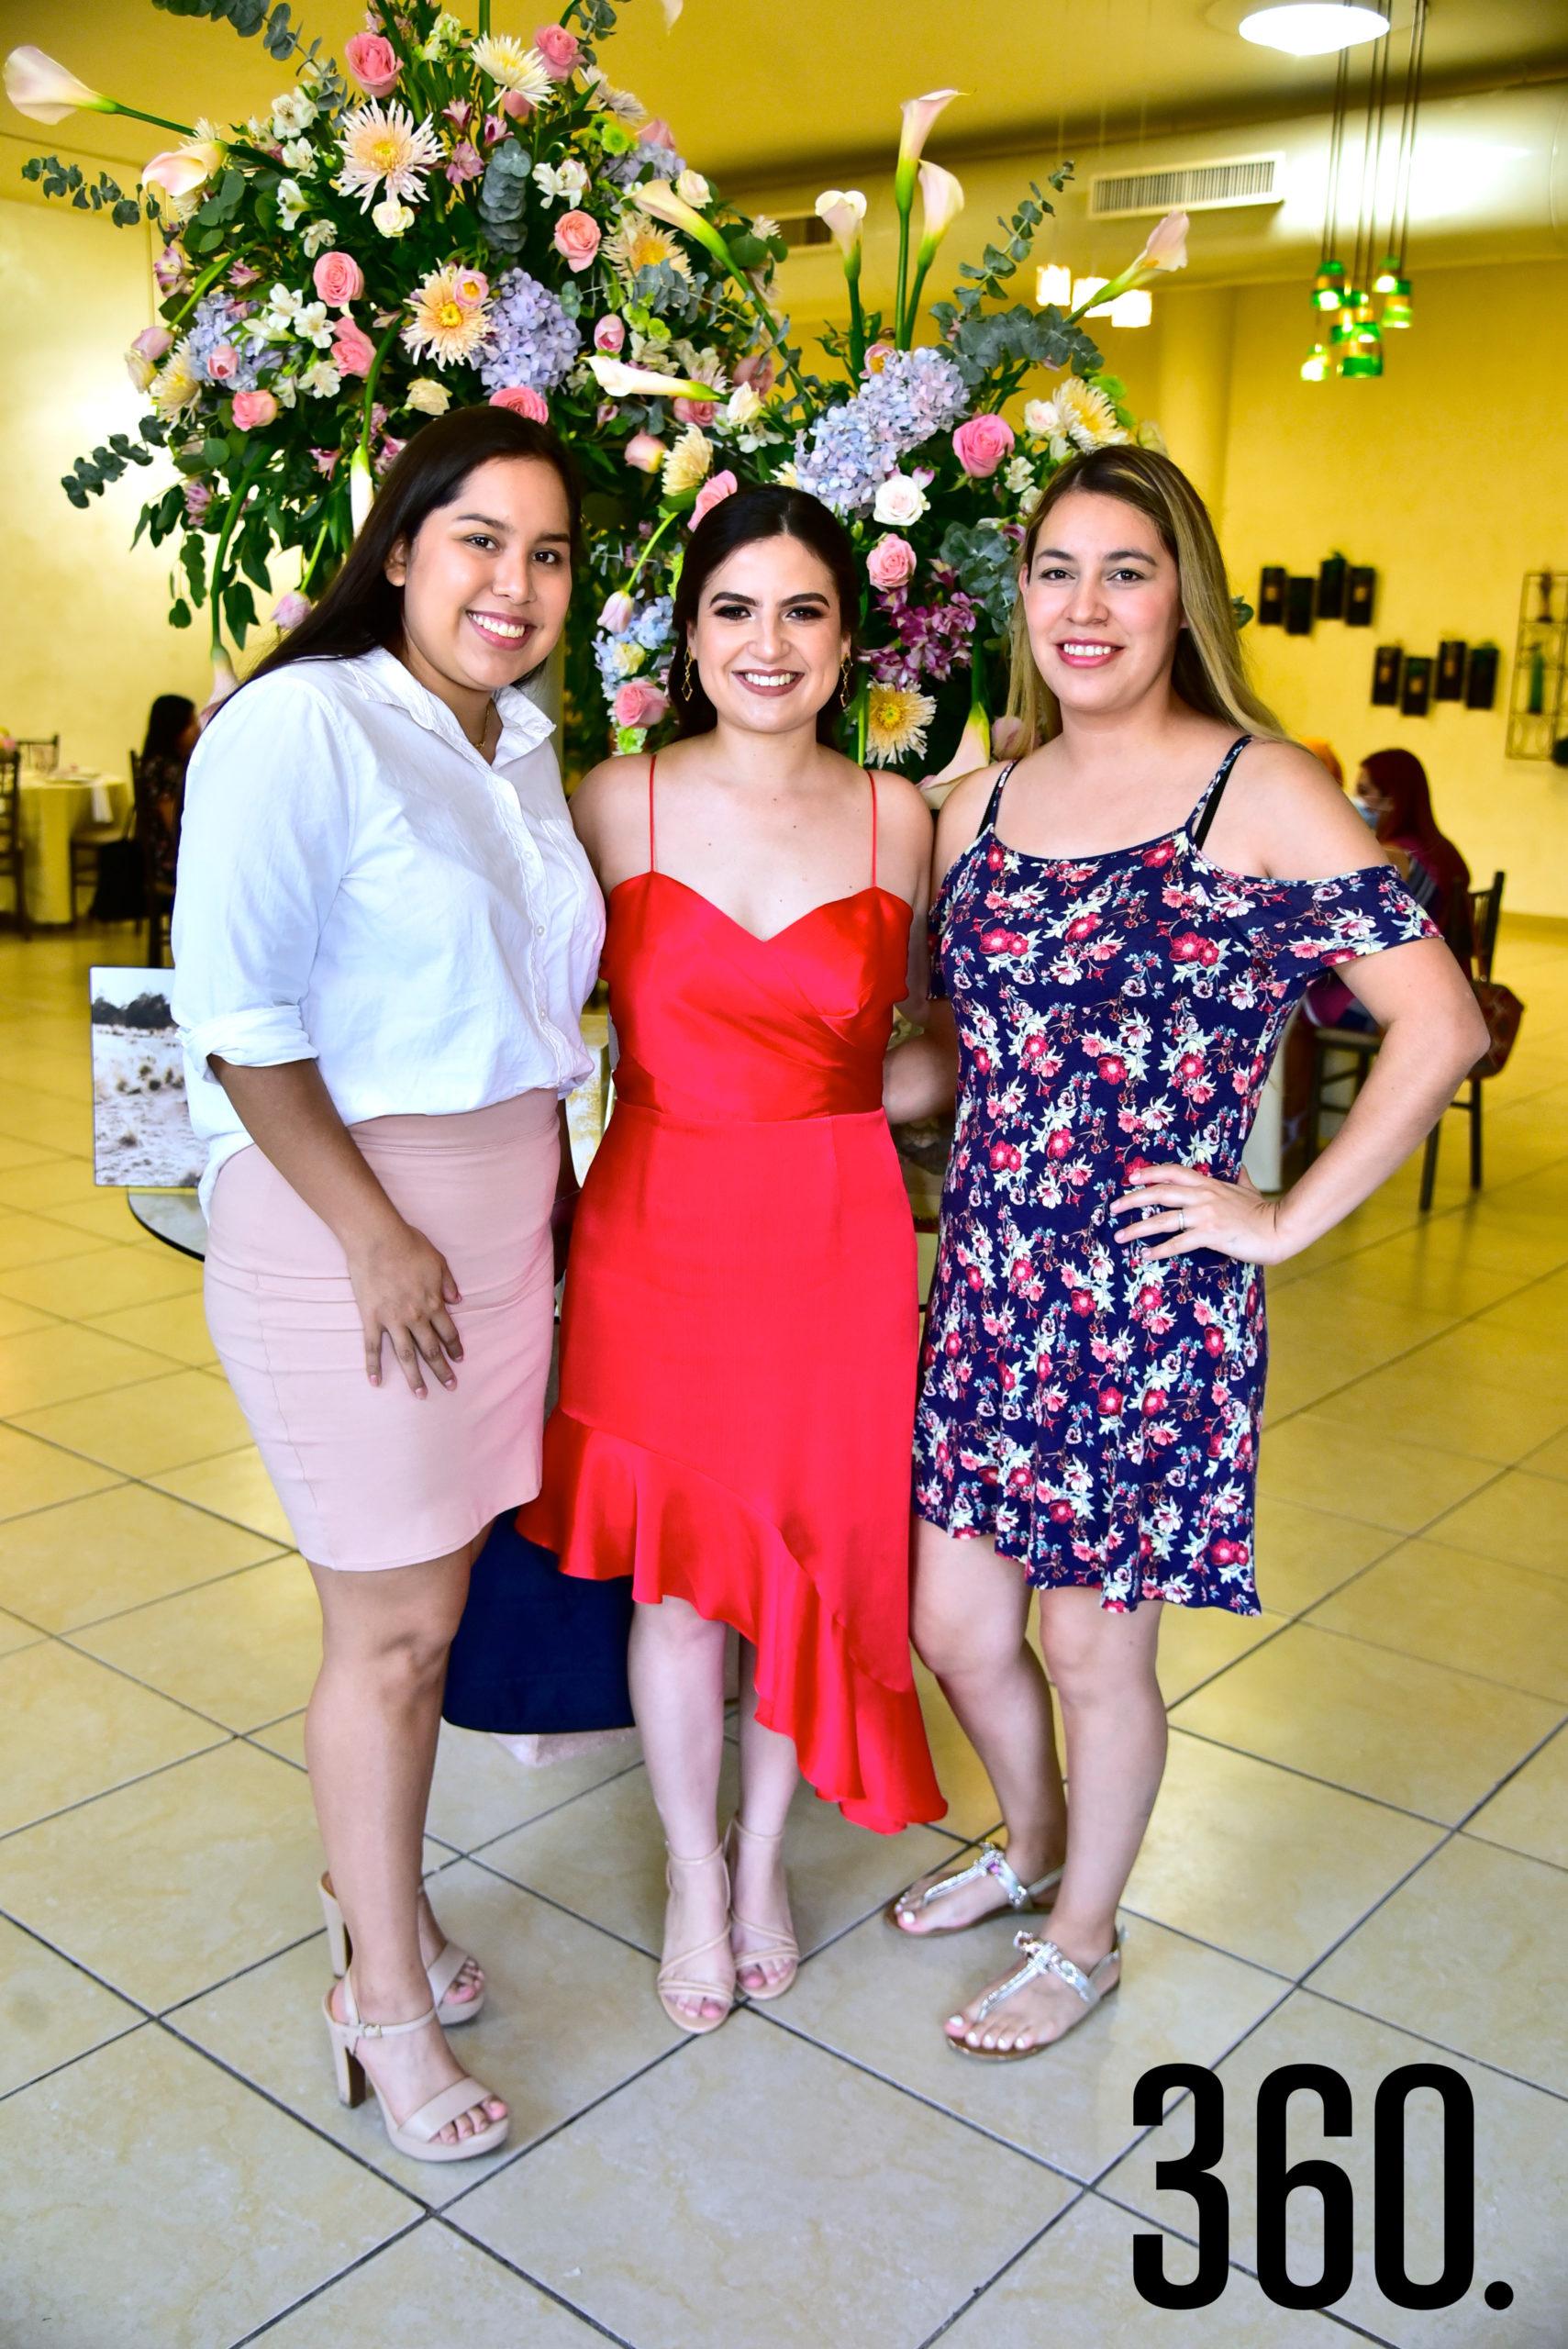 Heidy Oviedo, Ana Sofía Saucedo y Janeth Muñoz.